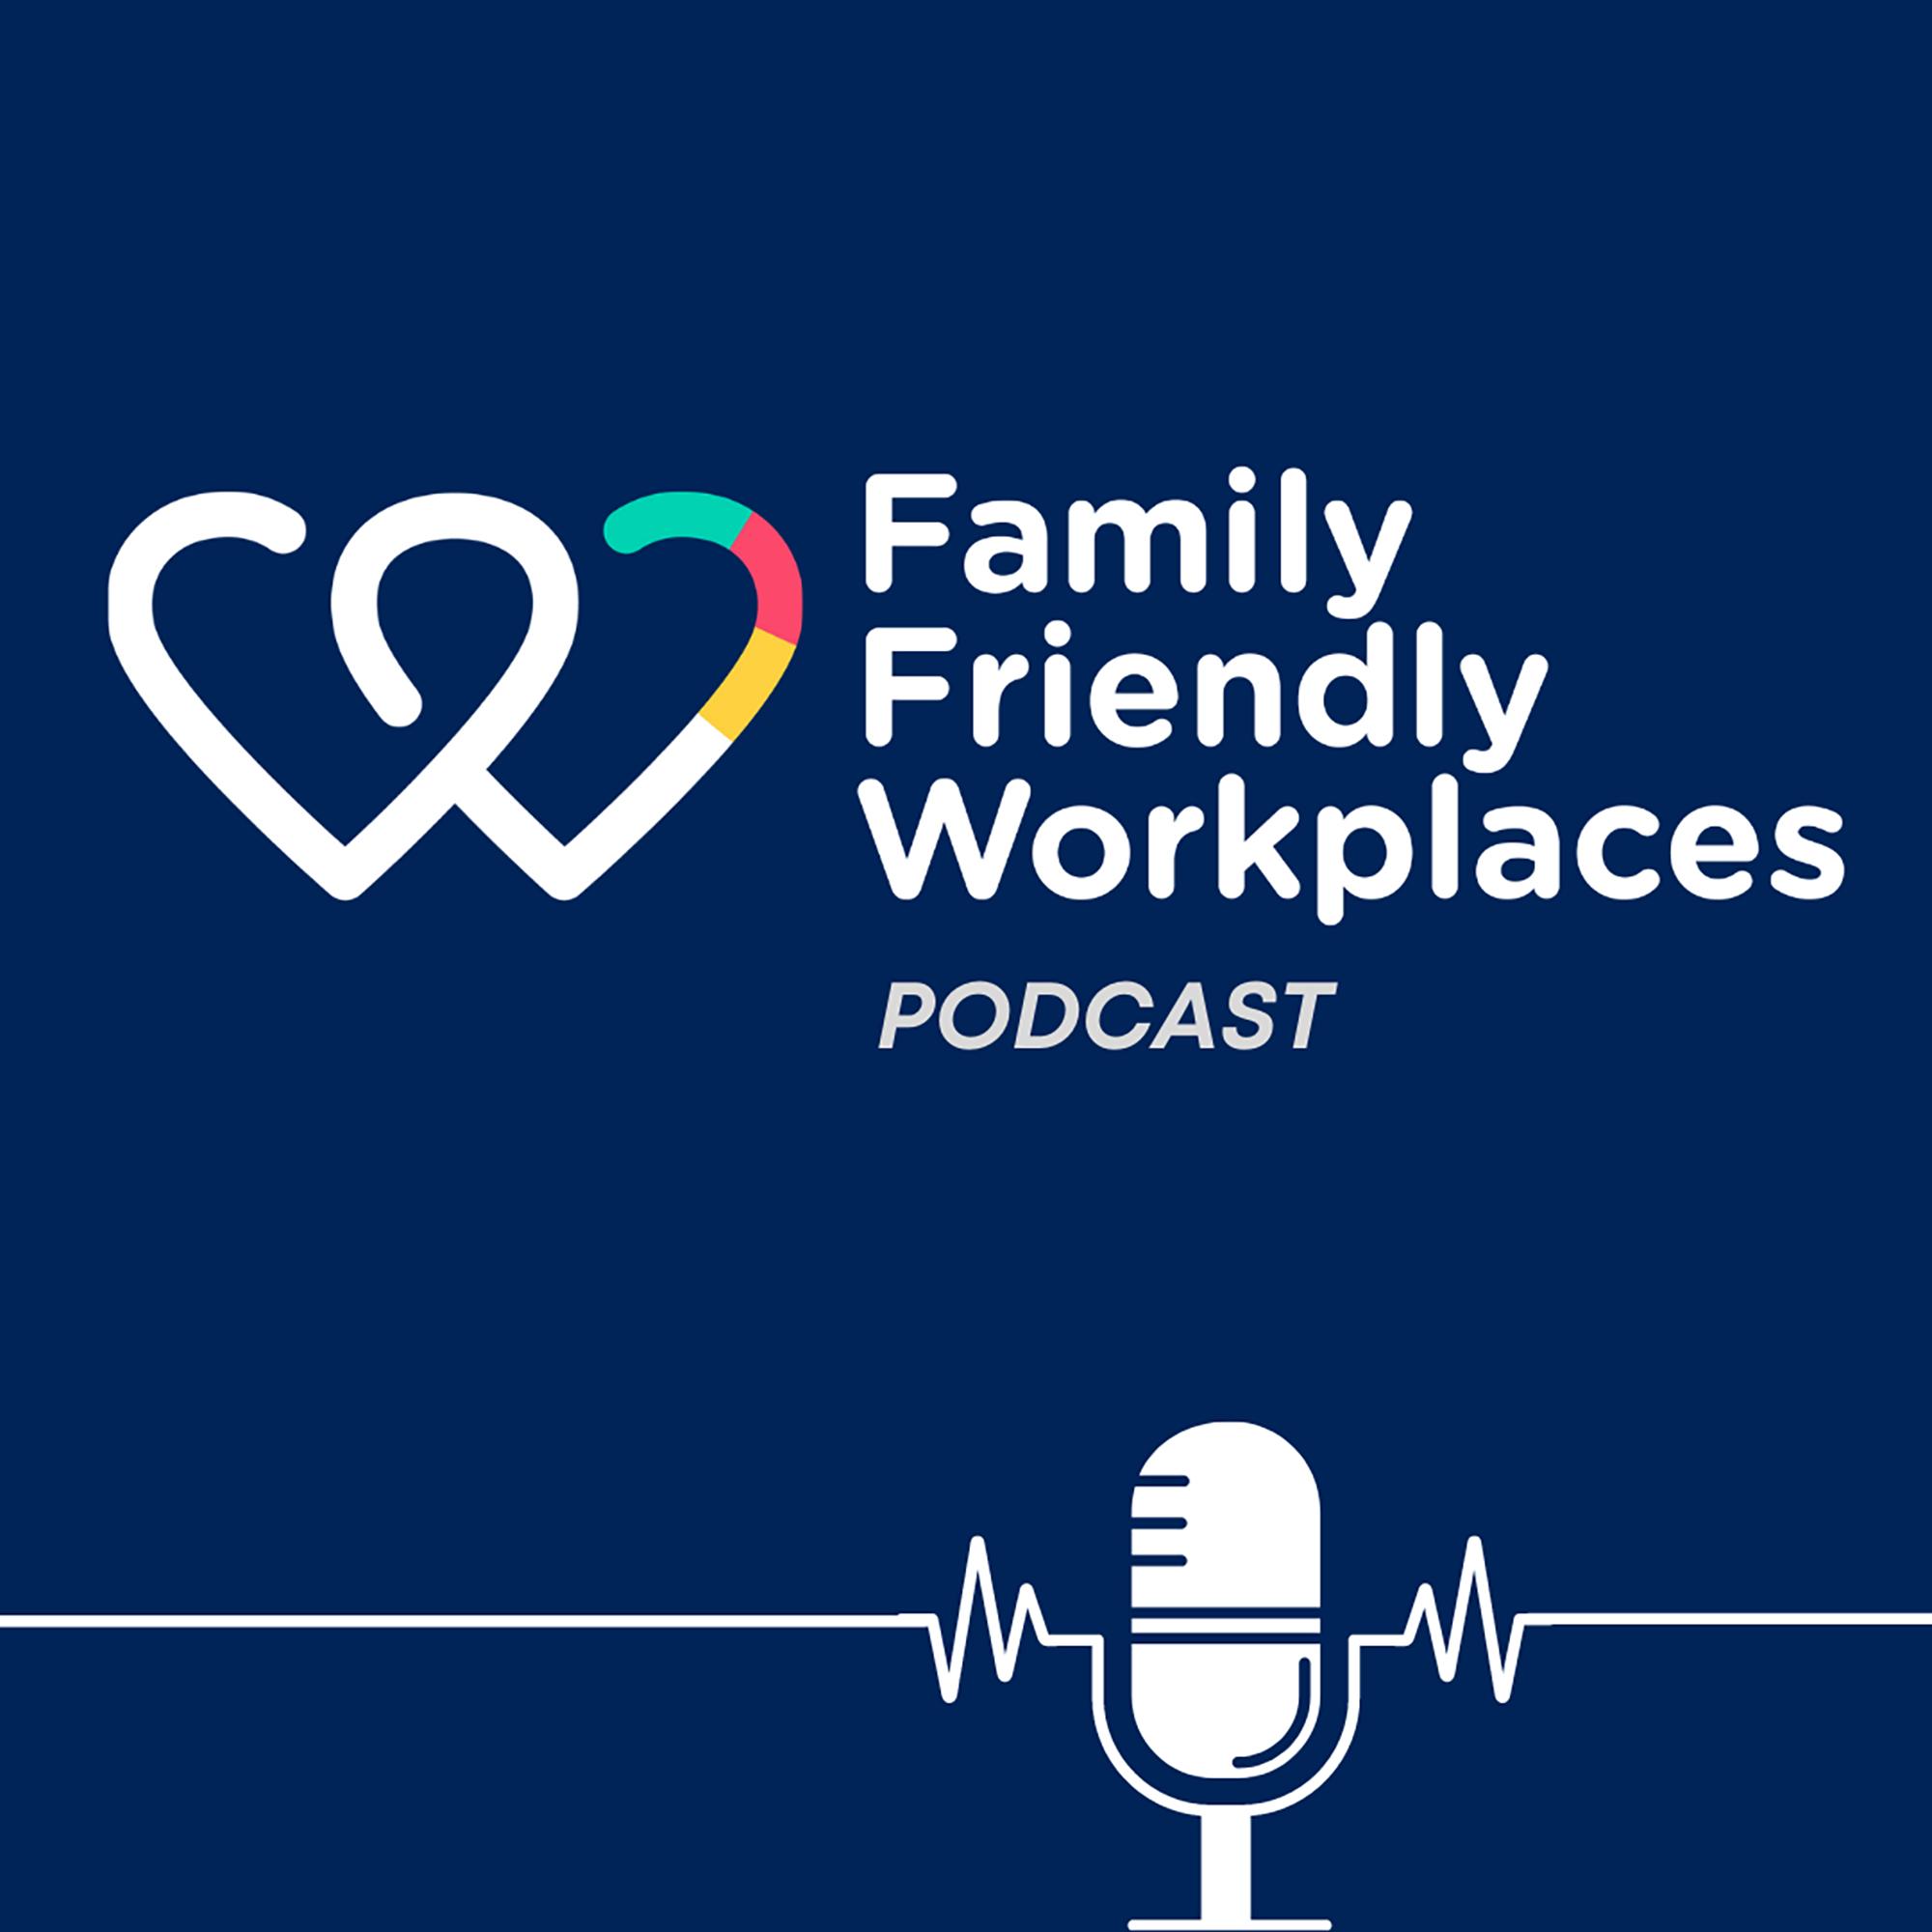 Artwork for podcast Parents At Work Podcast